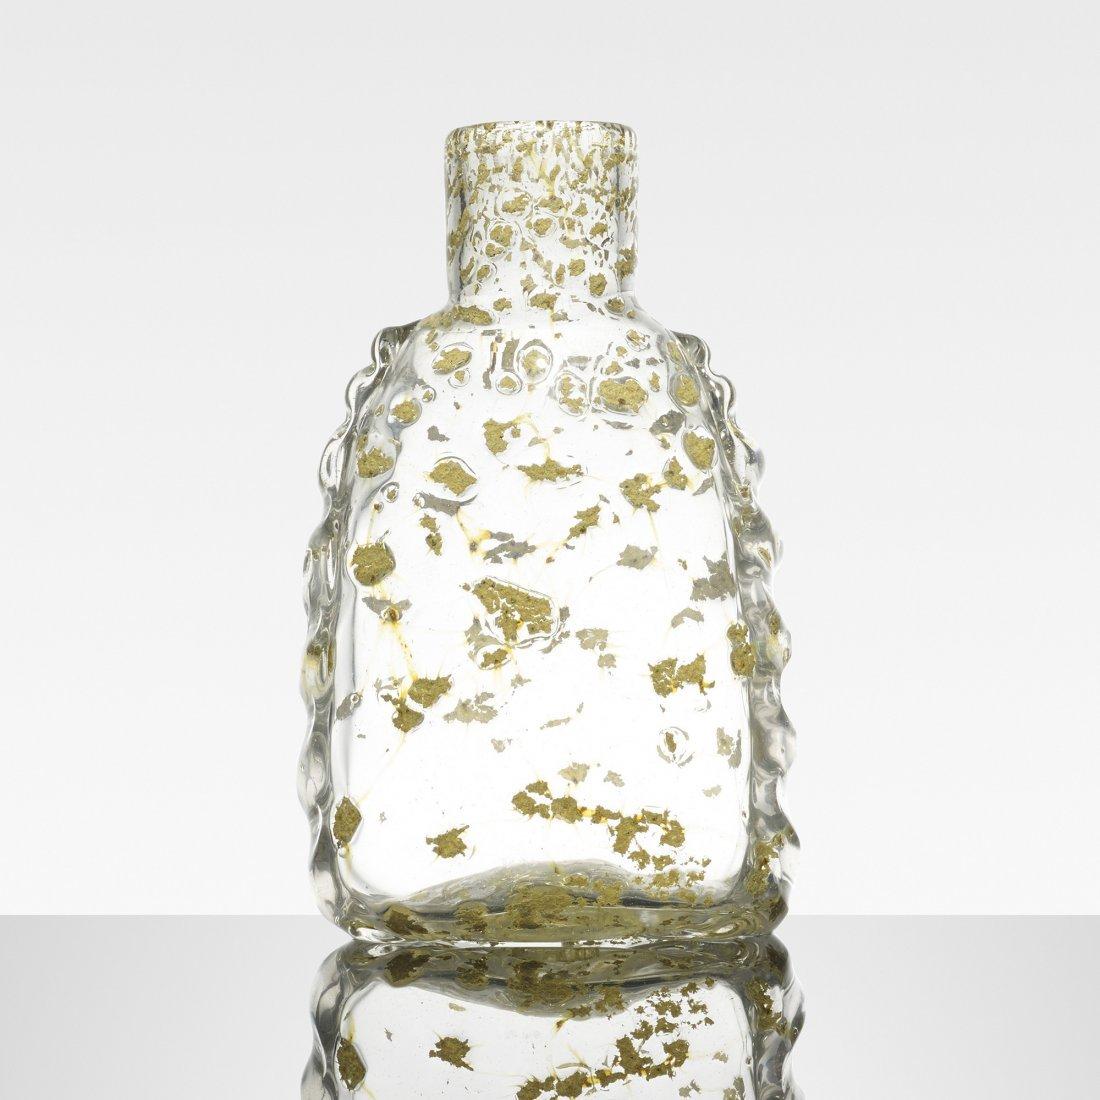 Ercole Barovier Autumno Gemmato vase